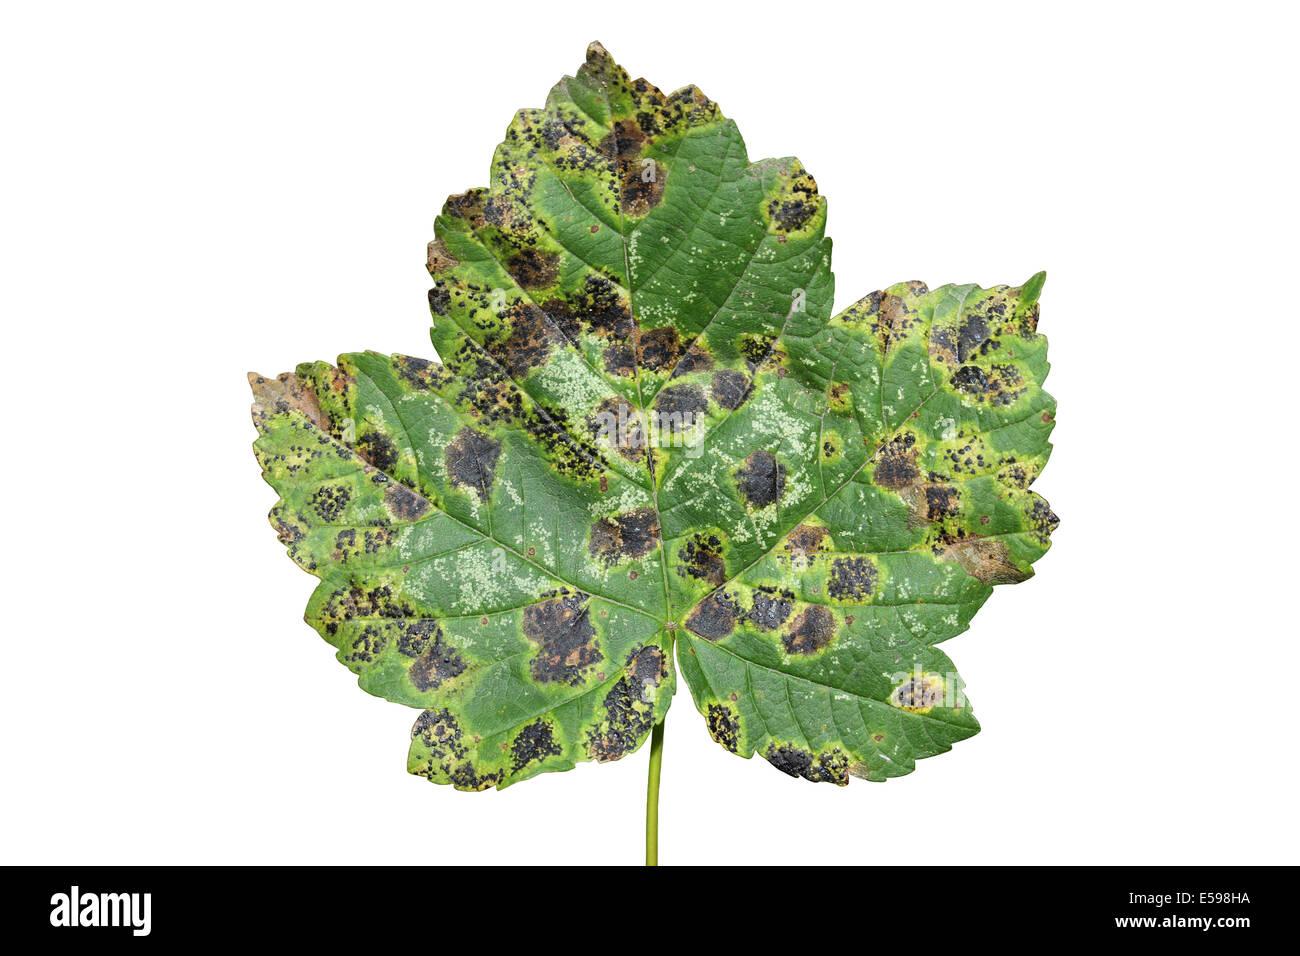 Tar Spot Fungus Rhytisma acerinum On Sycamore Acer pseudoplatanus Leaves - Stock Image